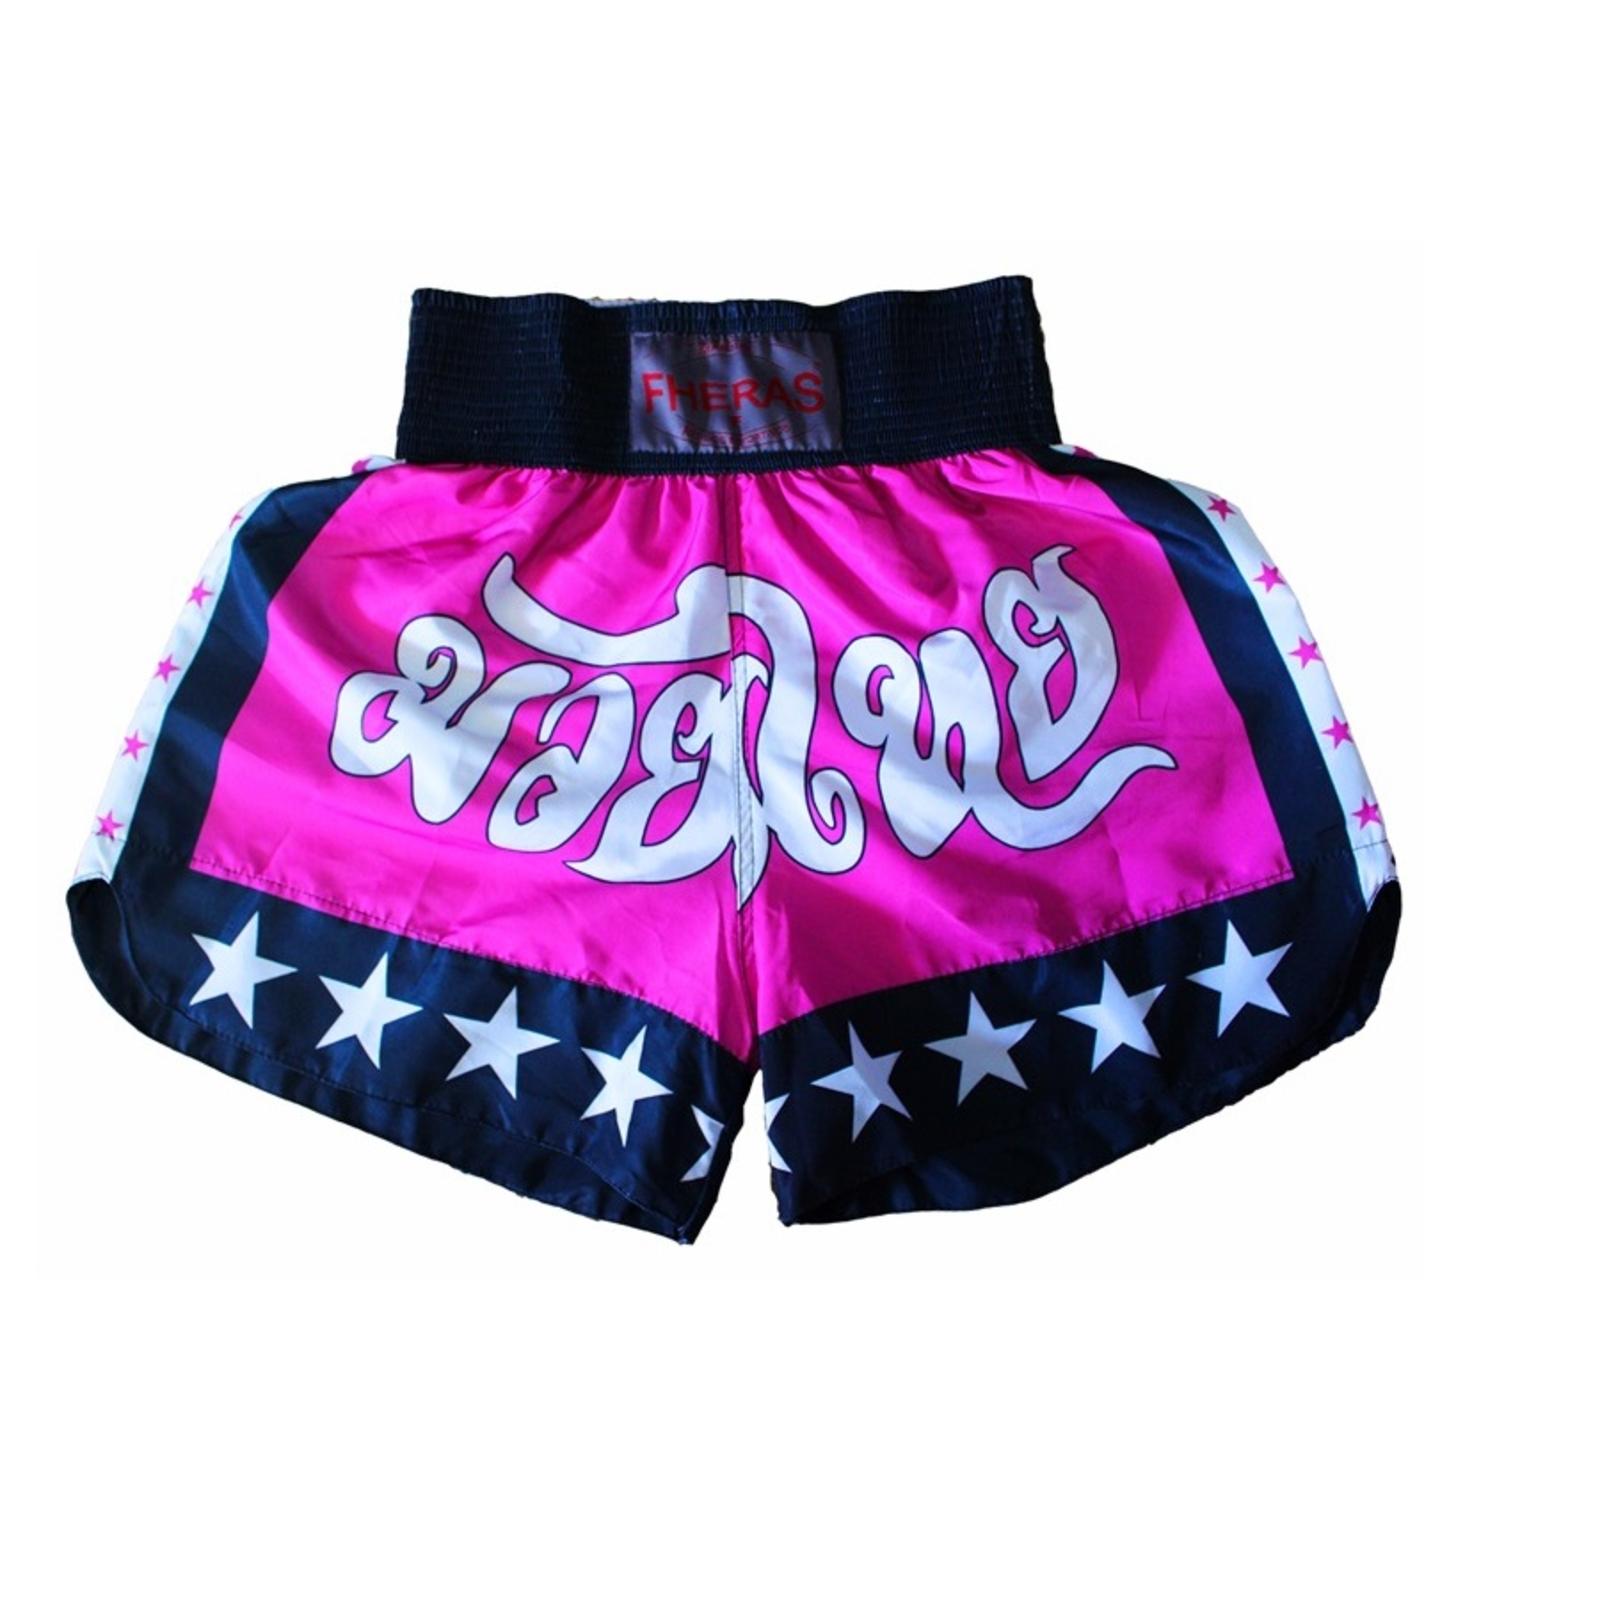 5b8d327a4 Kit Muay Thai Oríon Fheras Luva Bandagem Bucal Caneleira Shorts Bolsa 14 OZ  Rosa Branco